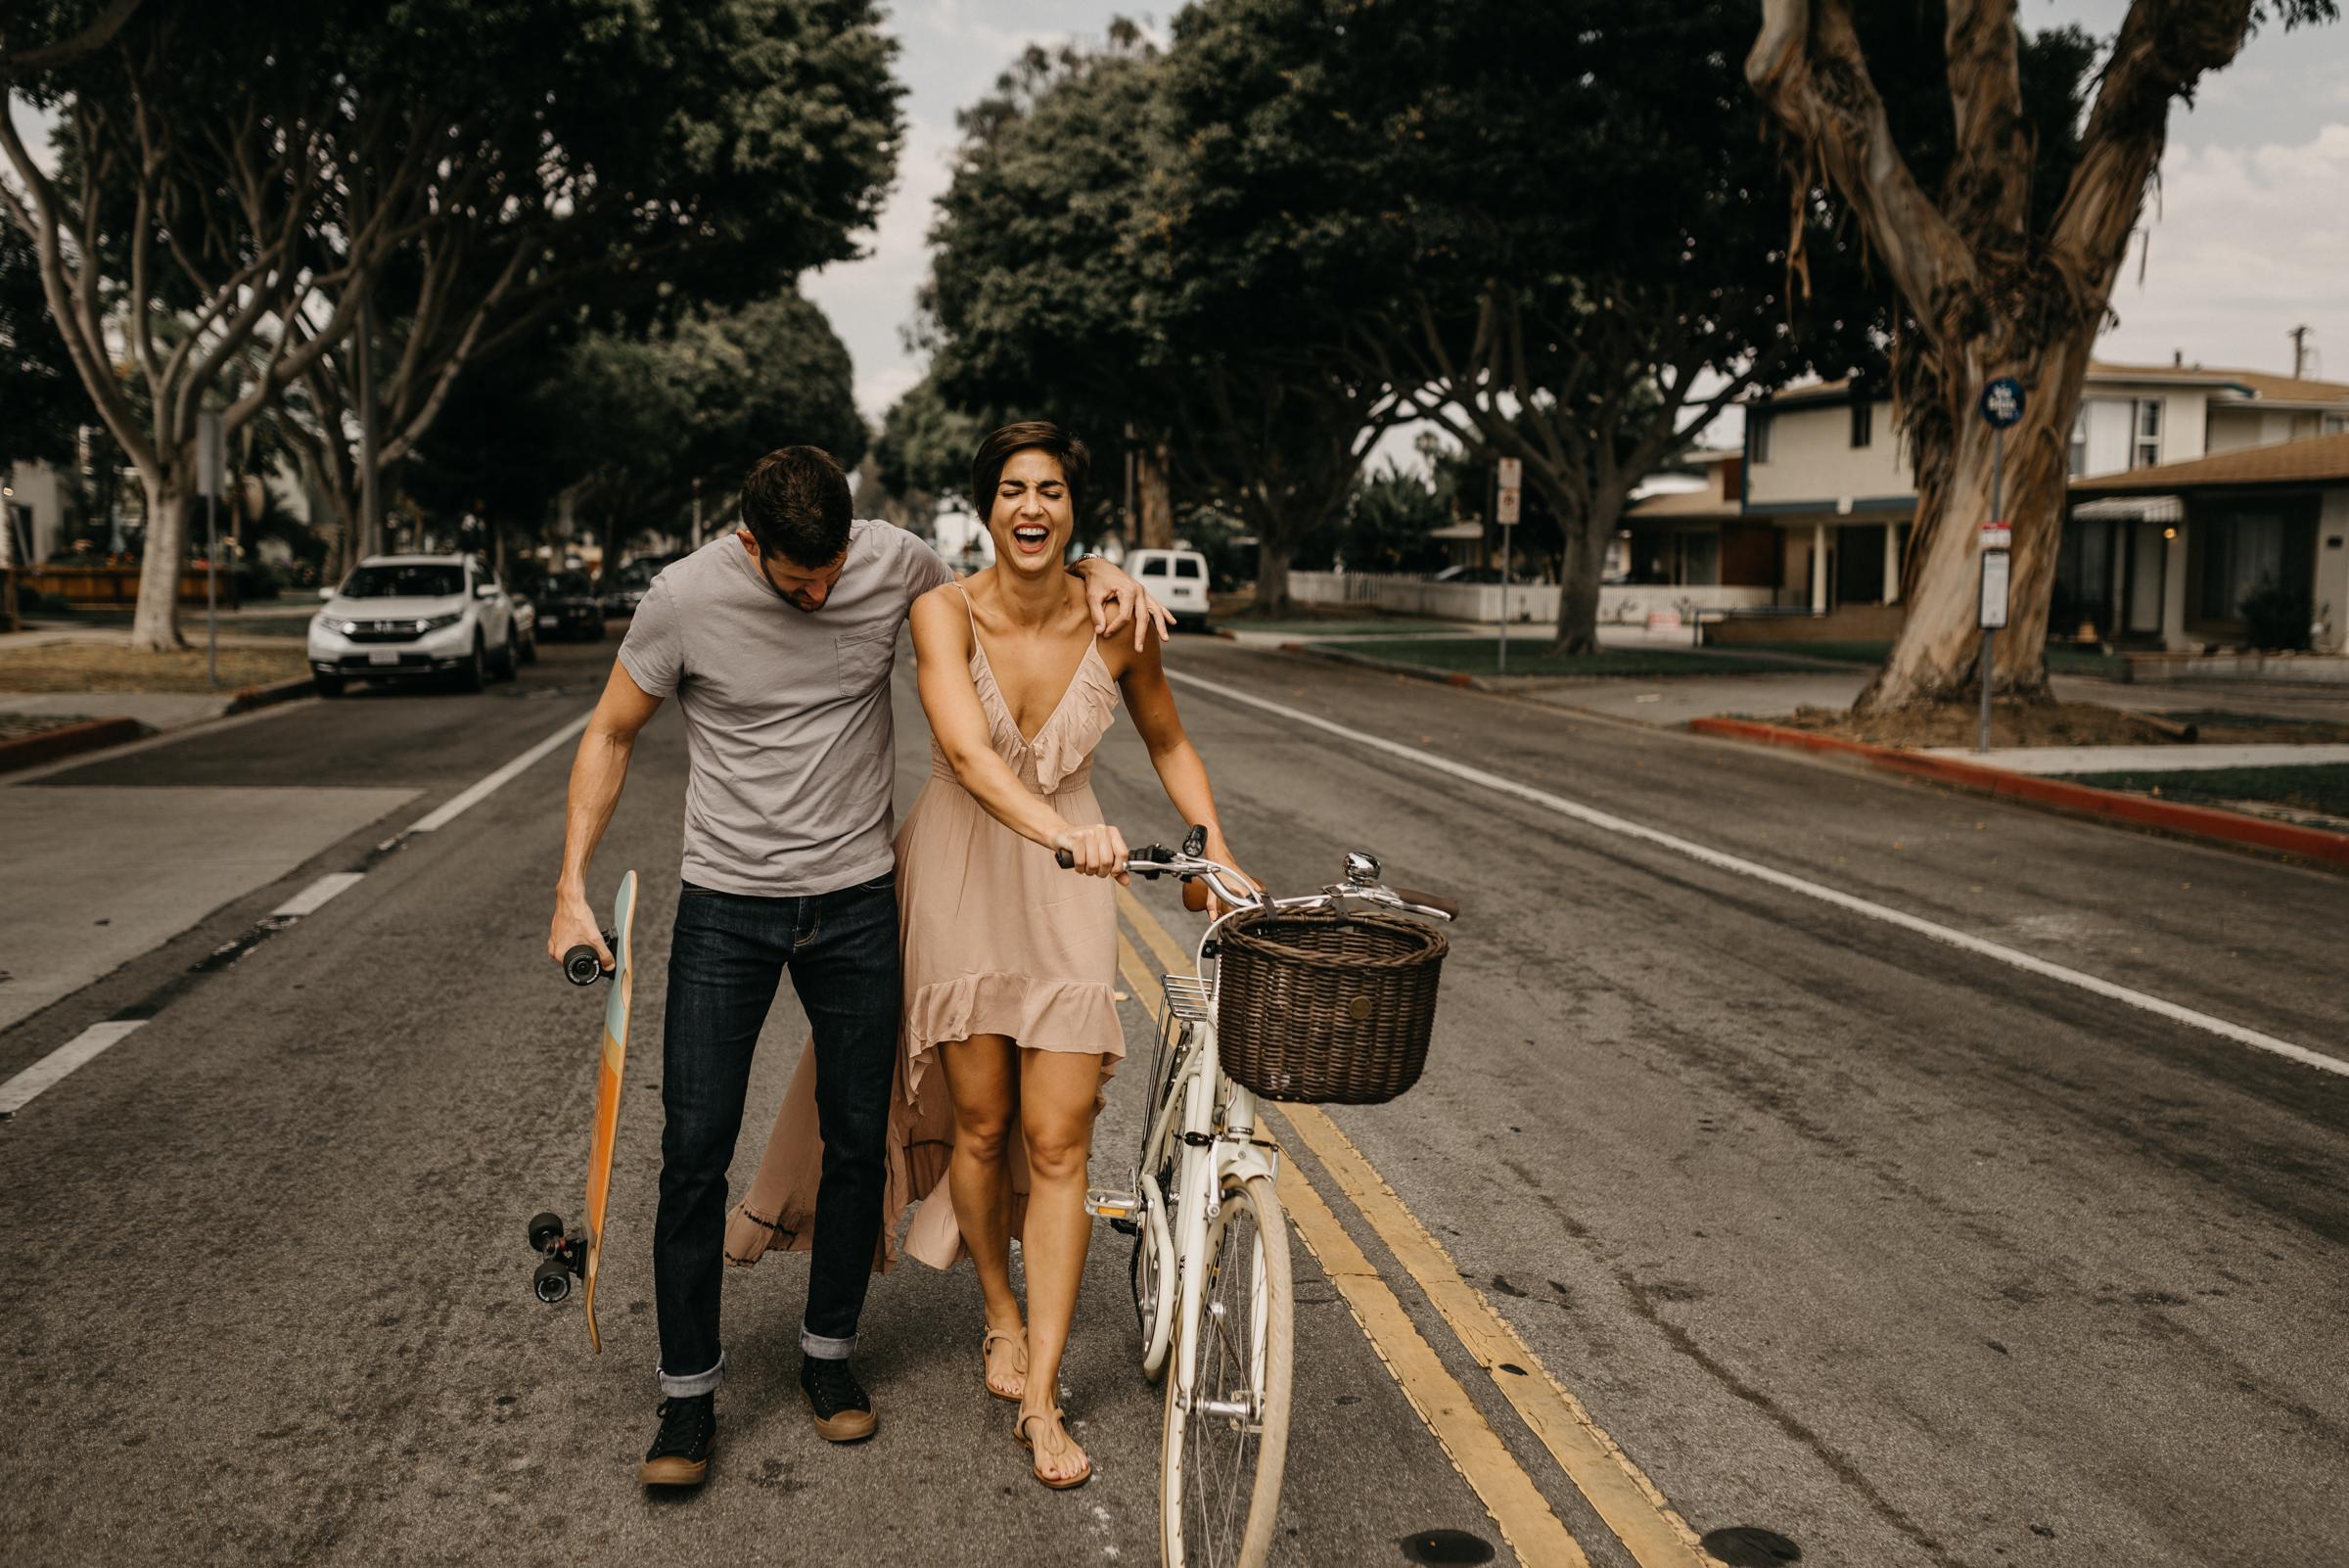 Isaiah + Taylor Photography - Venice Beach & Santa Monica Engagement Session, Los Angeles Wedding Photographer-015.jpg